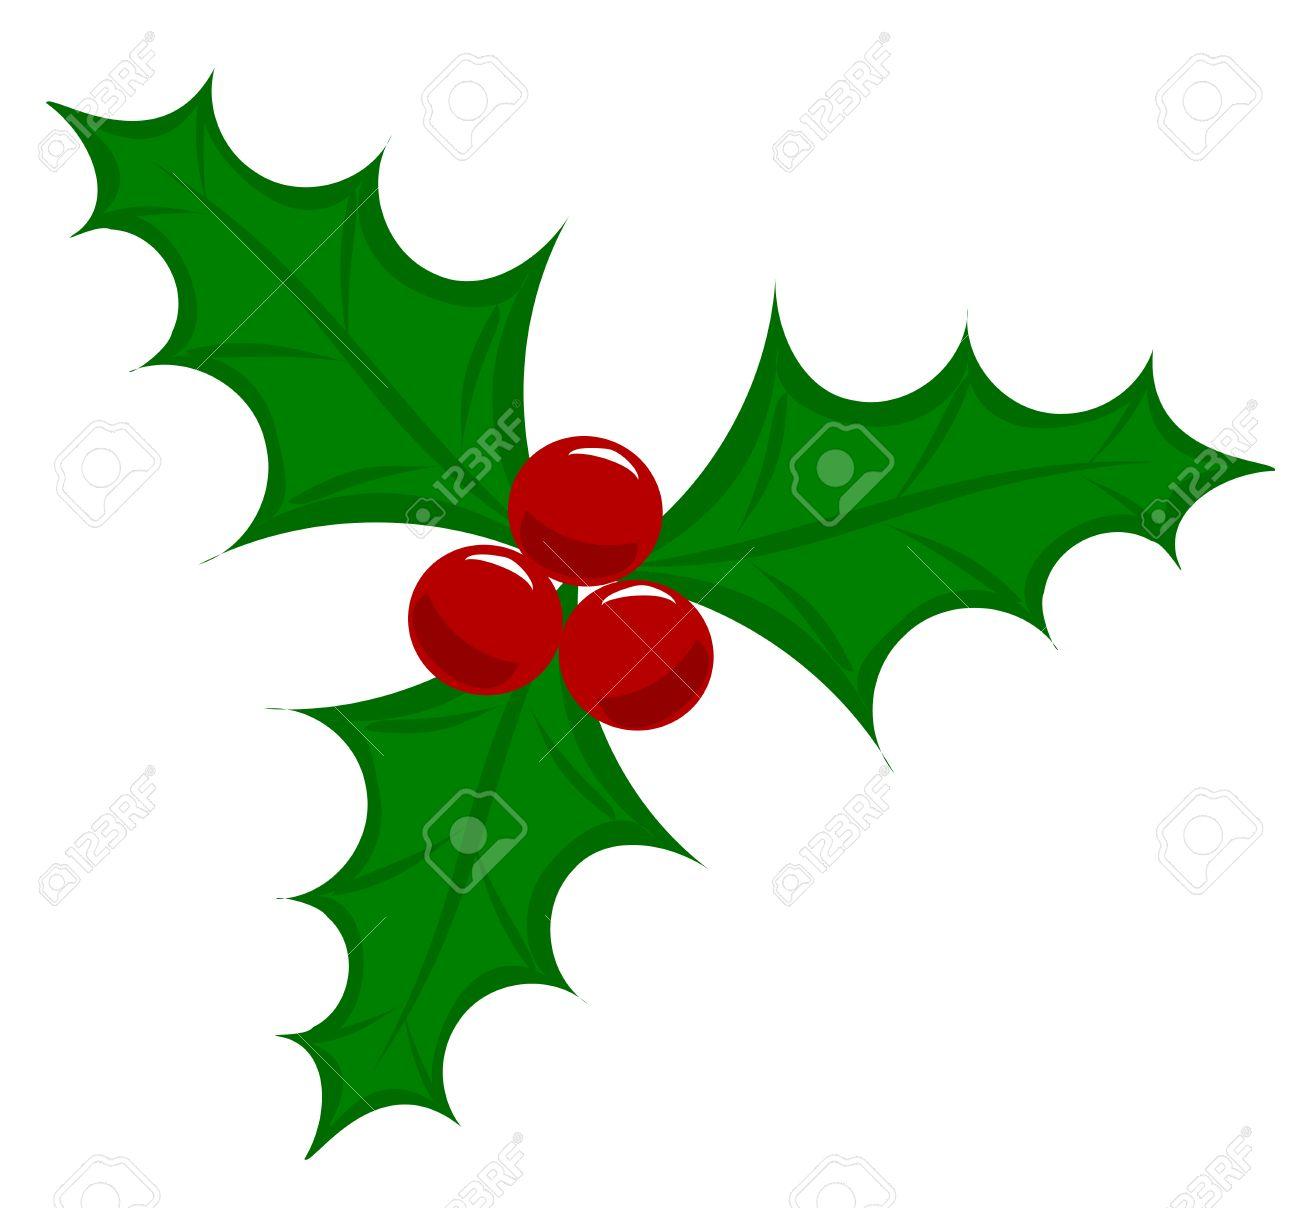 Symbolic Christmas holly berry illustration.